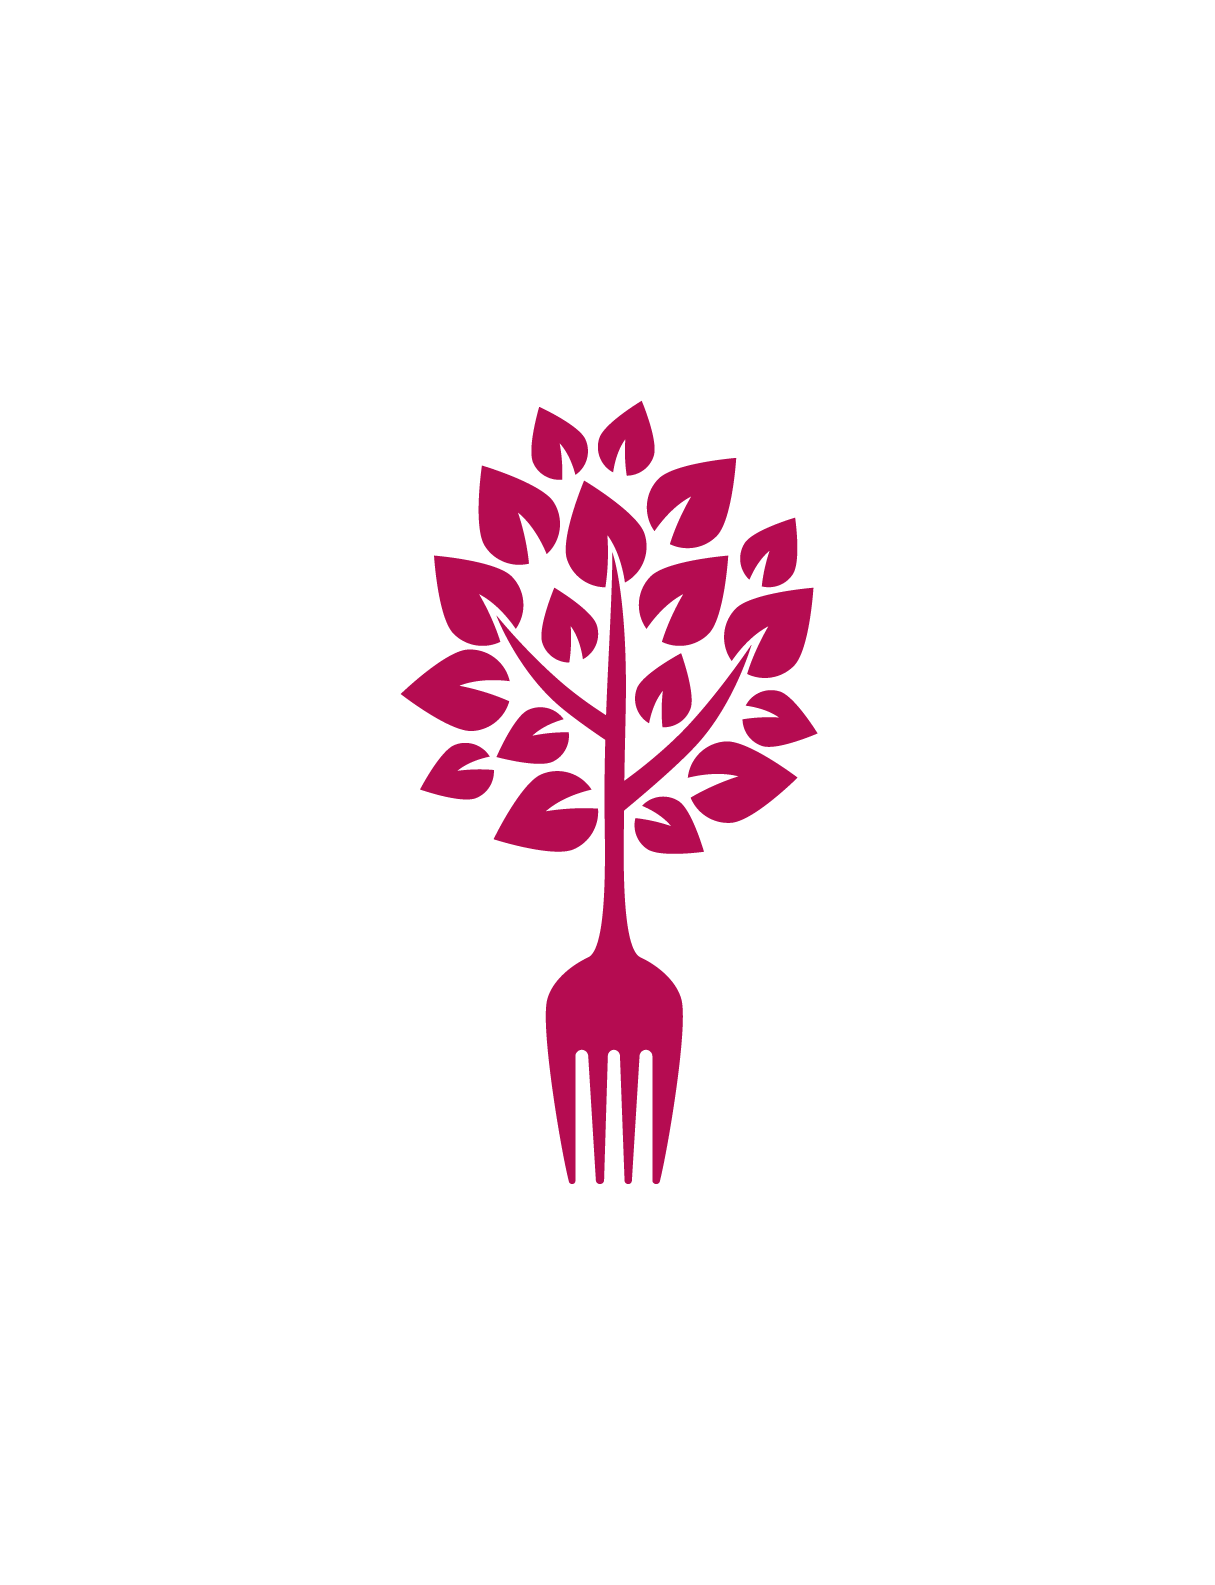 Share Company symboli Yhdessä. Aidosti